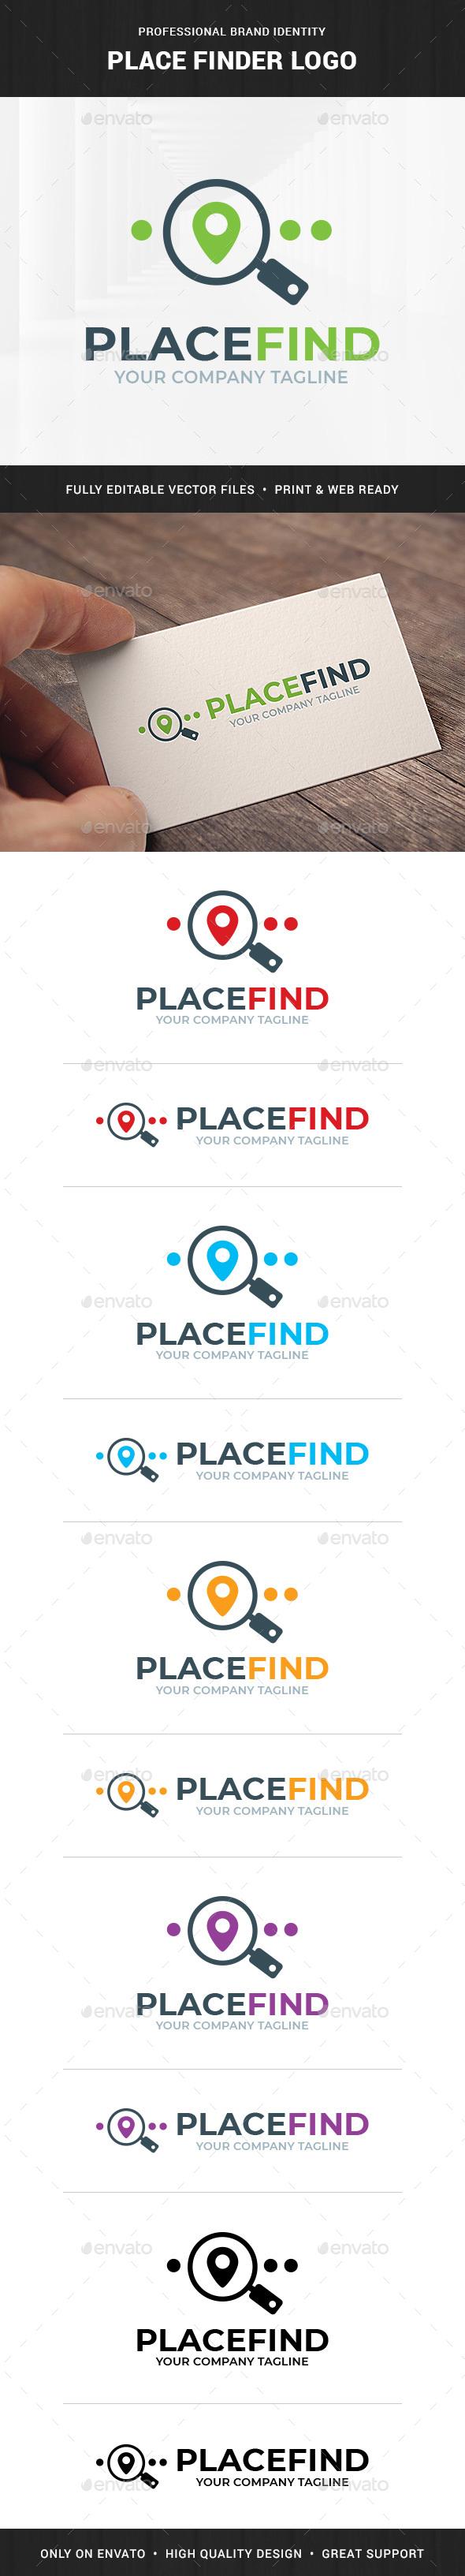 Place Finder Logo Template - Symbols Logo Templates